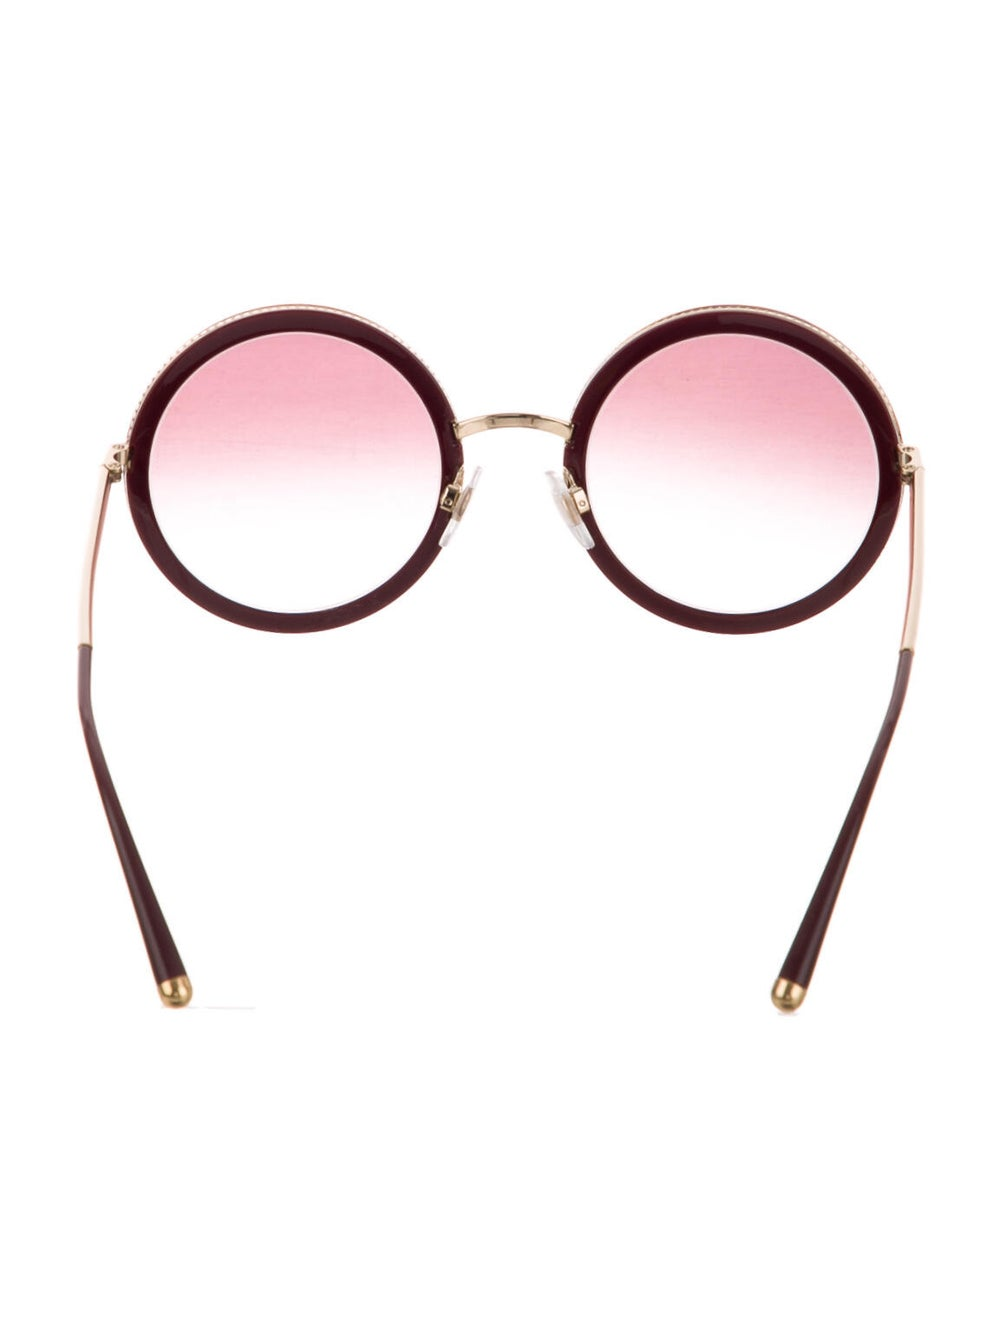 Dolce & Gabbana Round Gradient Sunglasses - image 3